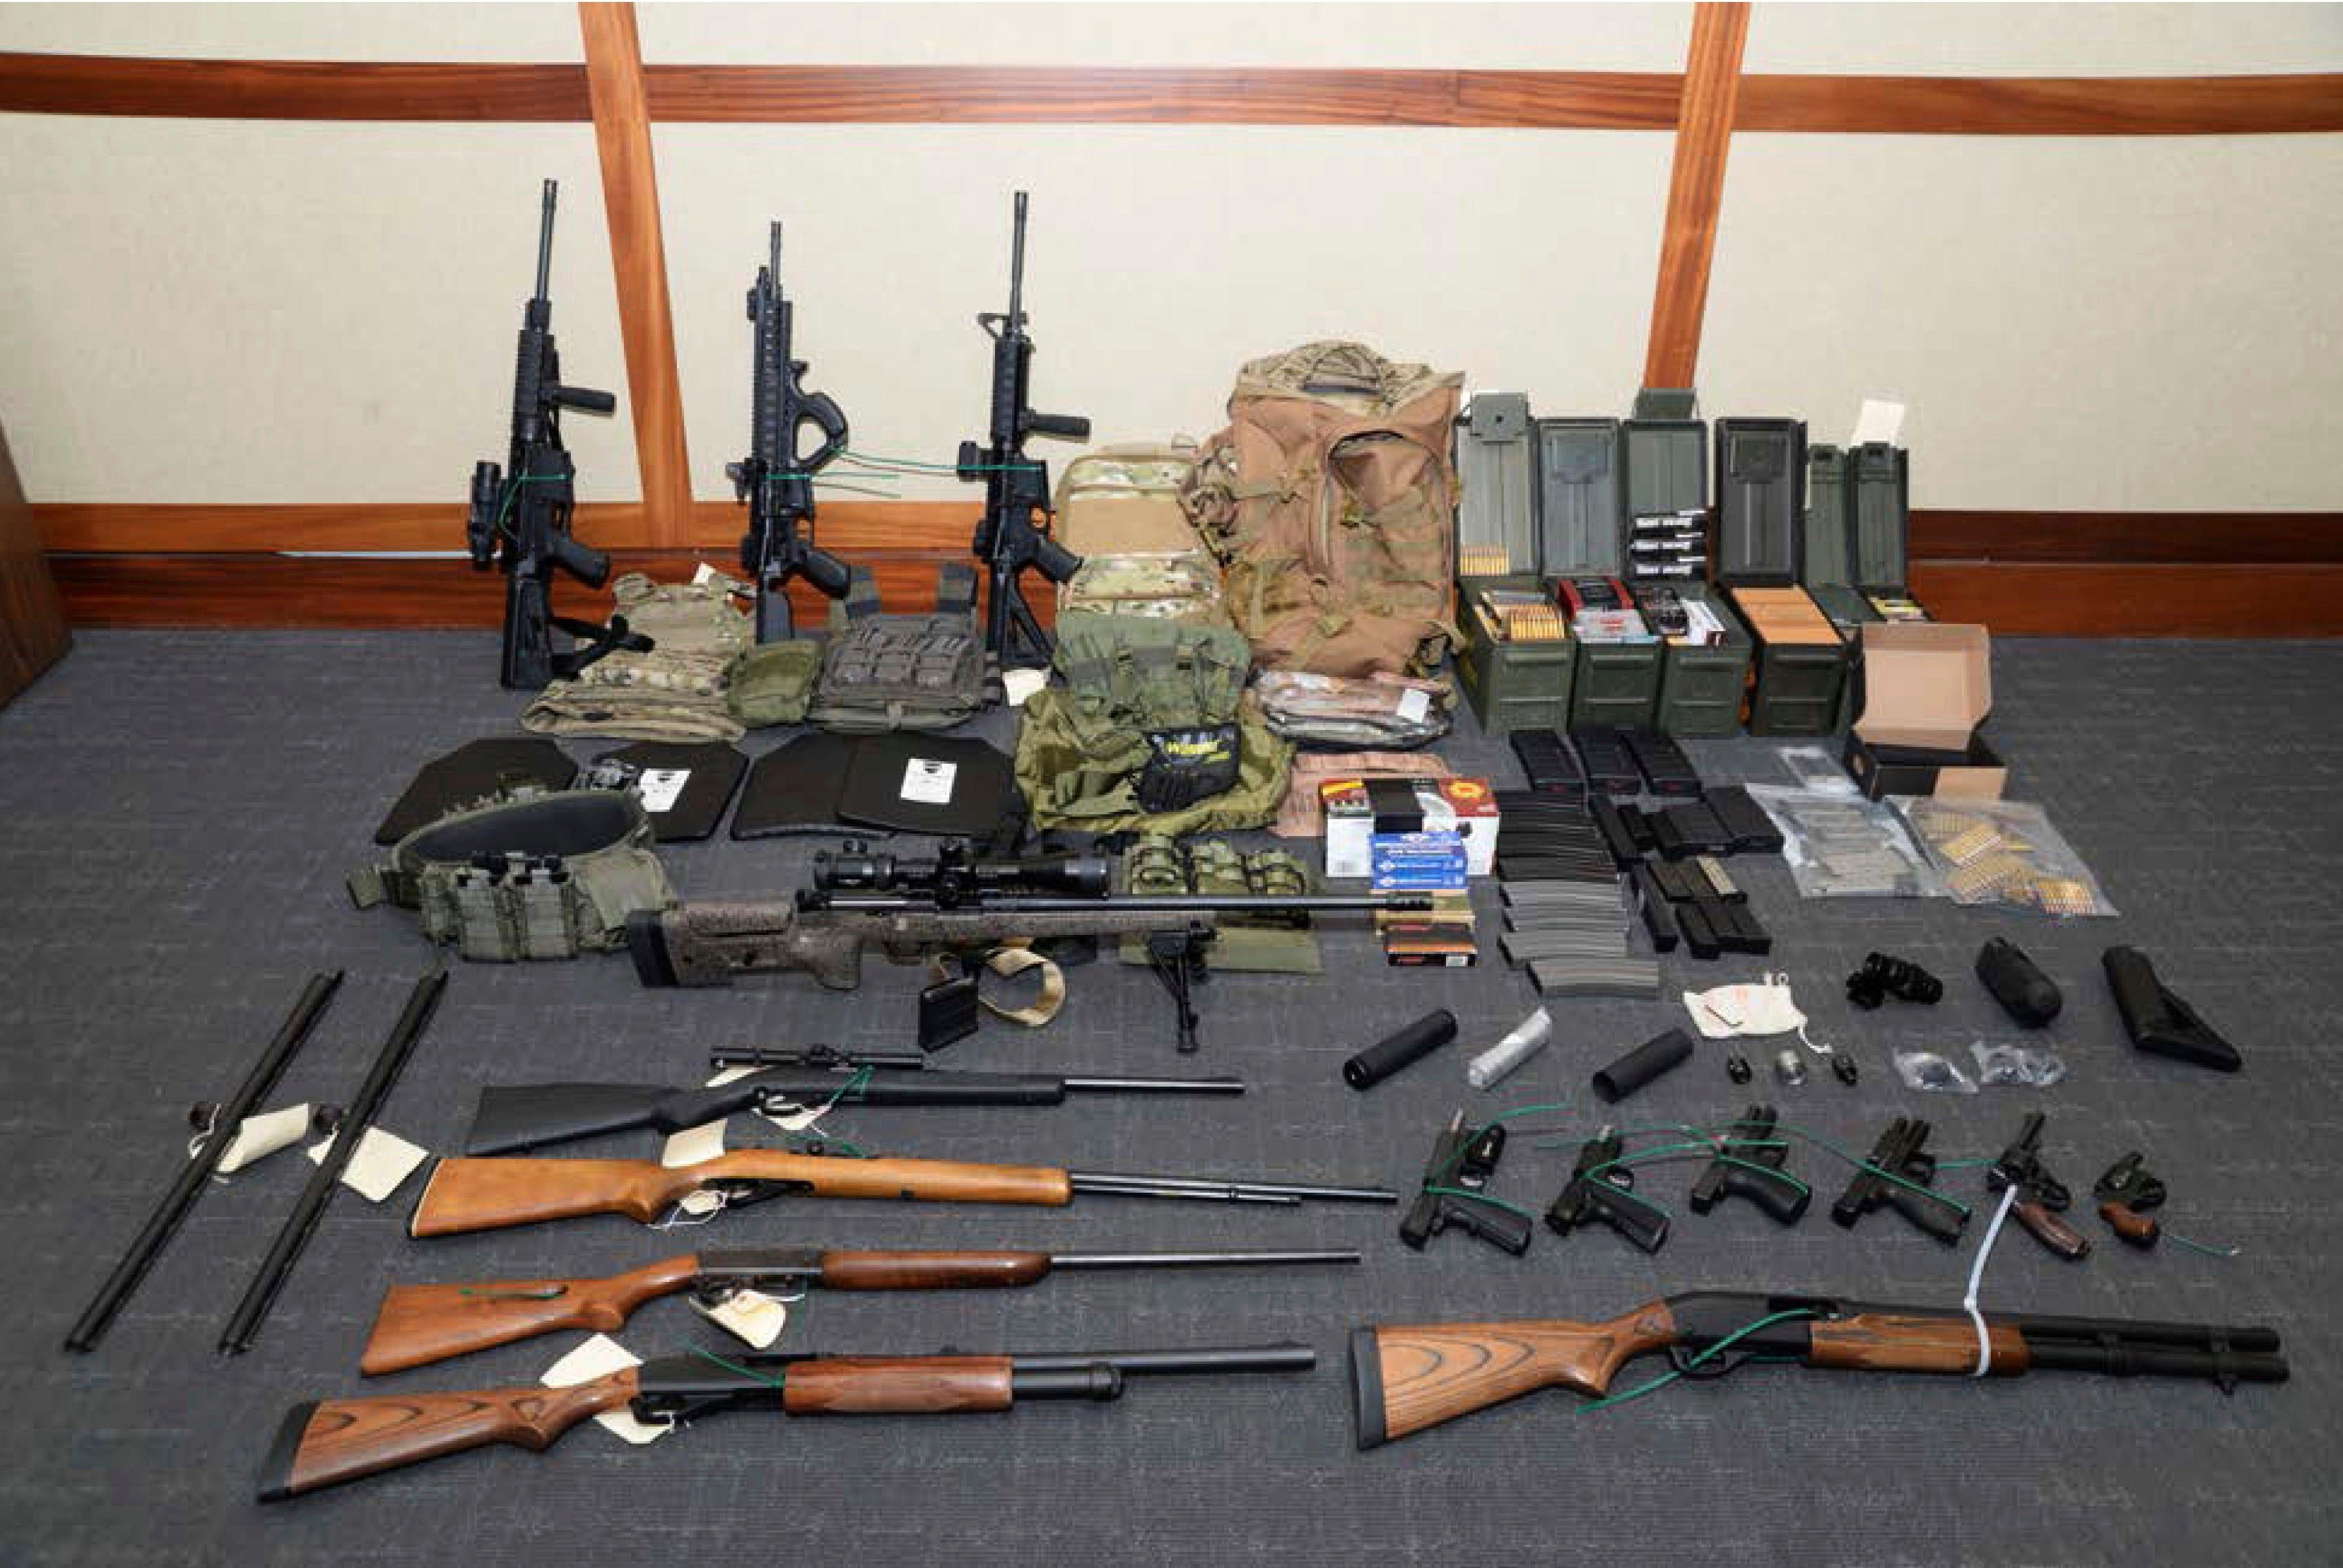 Coronavirus Run On Guns Highlights Need For More Gun Safety Research